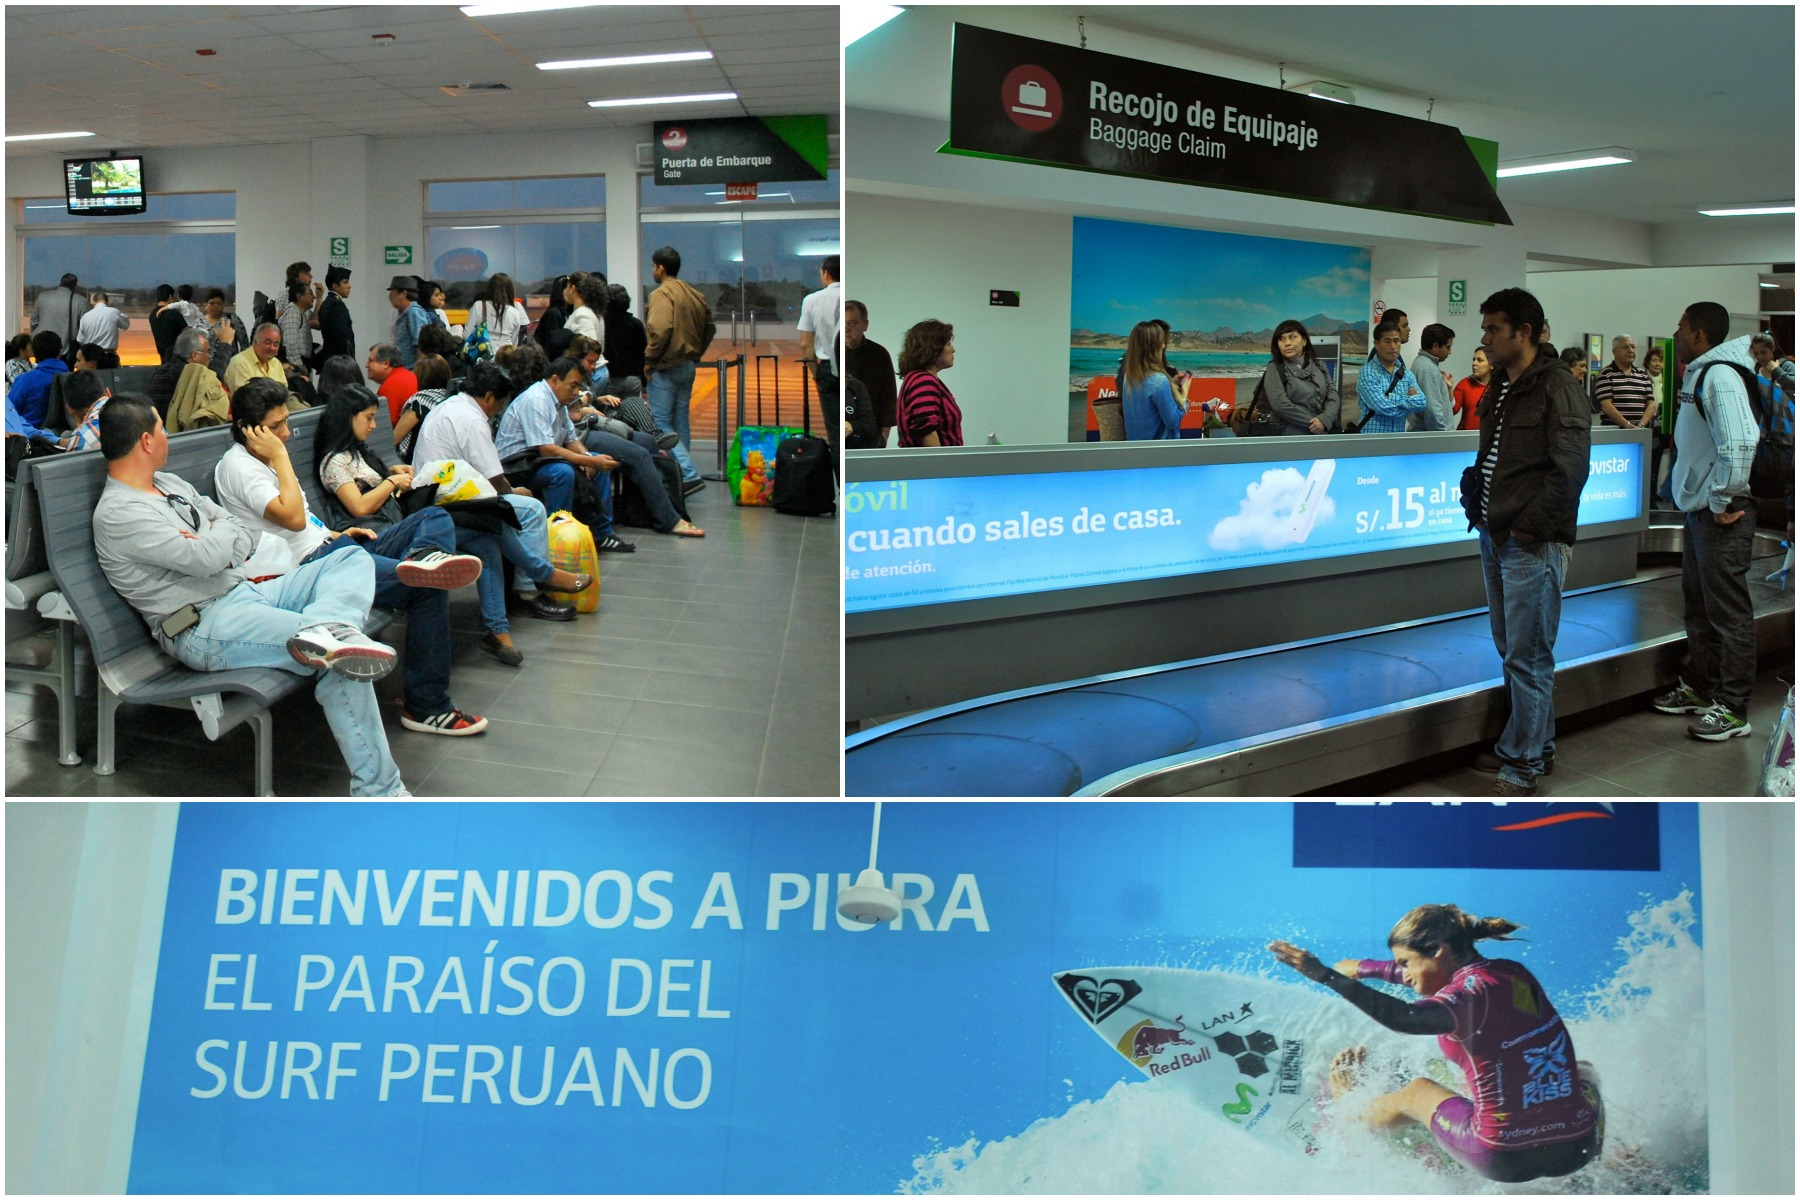 Aeroporto de Piura, Peru